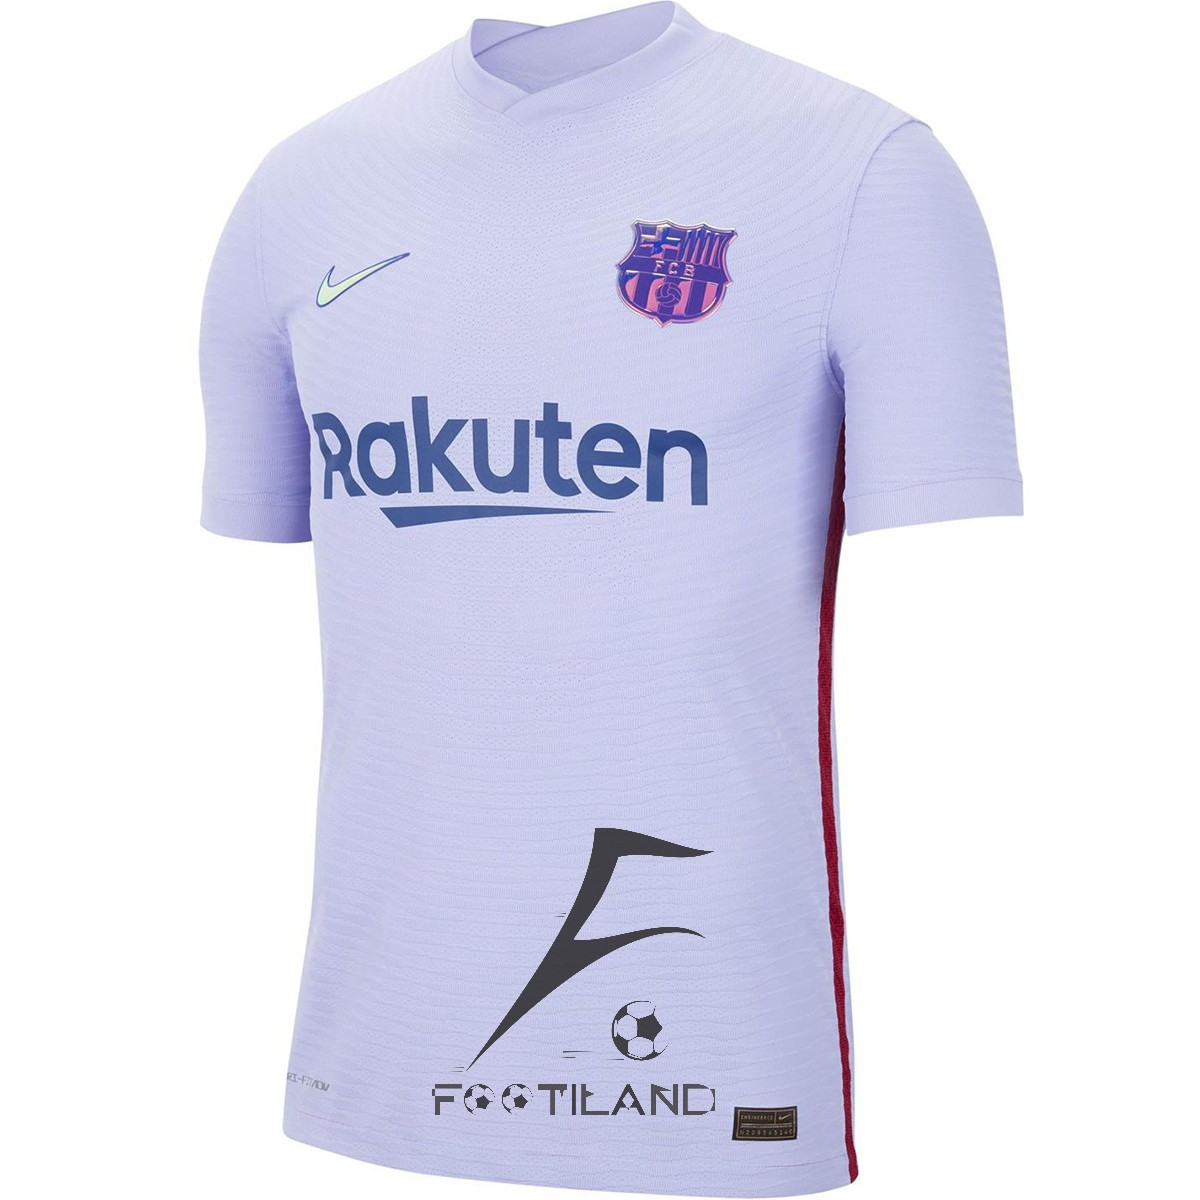 لباس پلیری بارسلونا دوم 2022